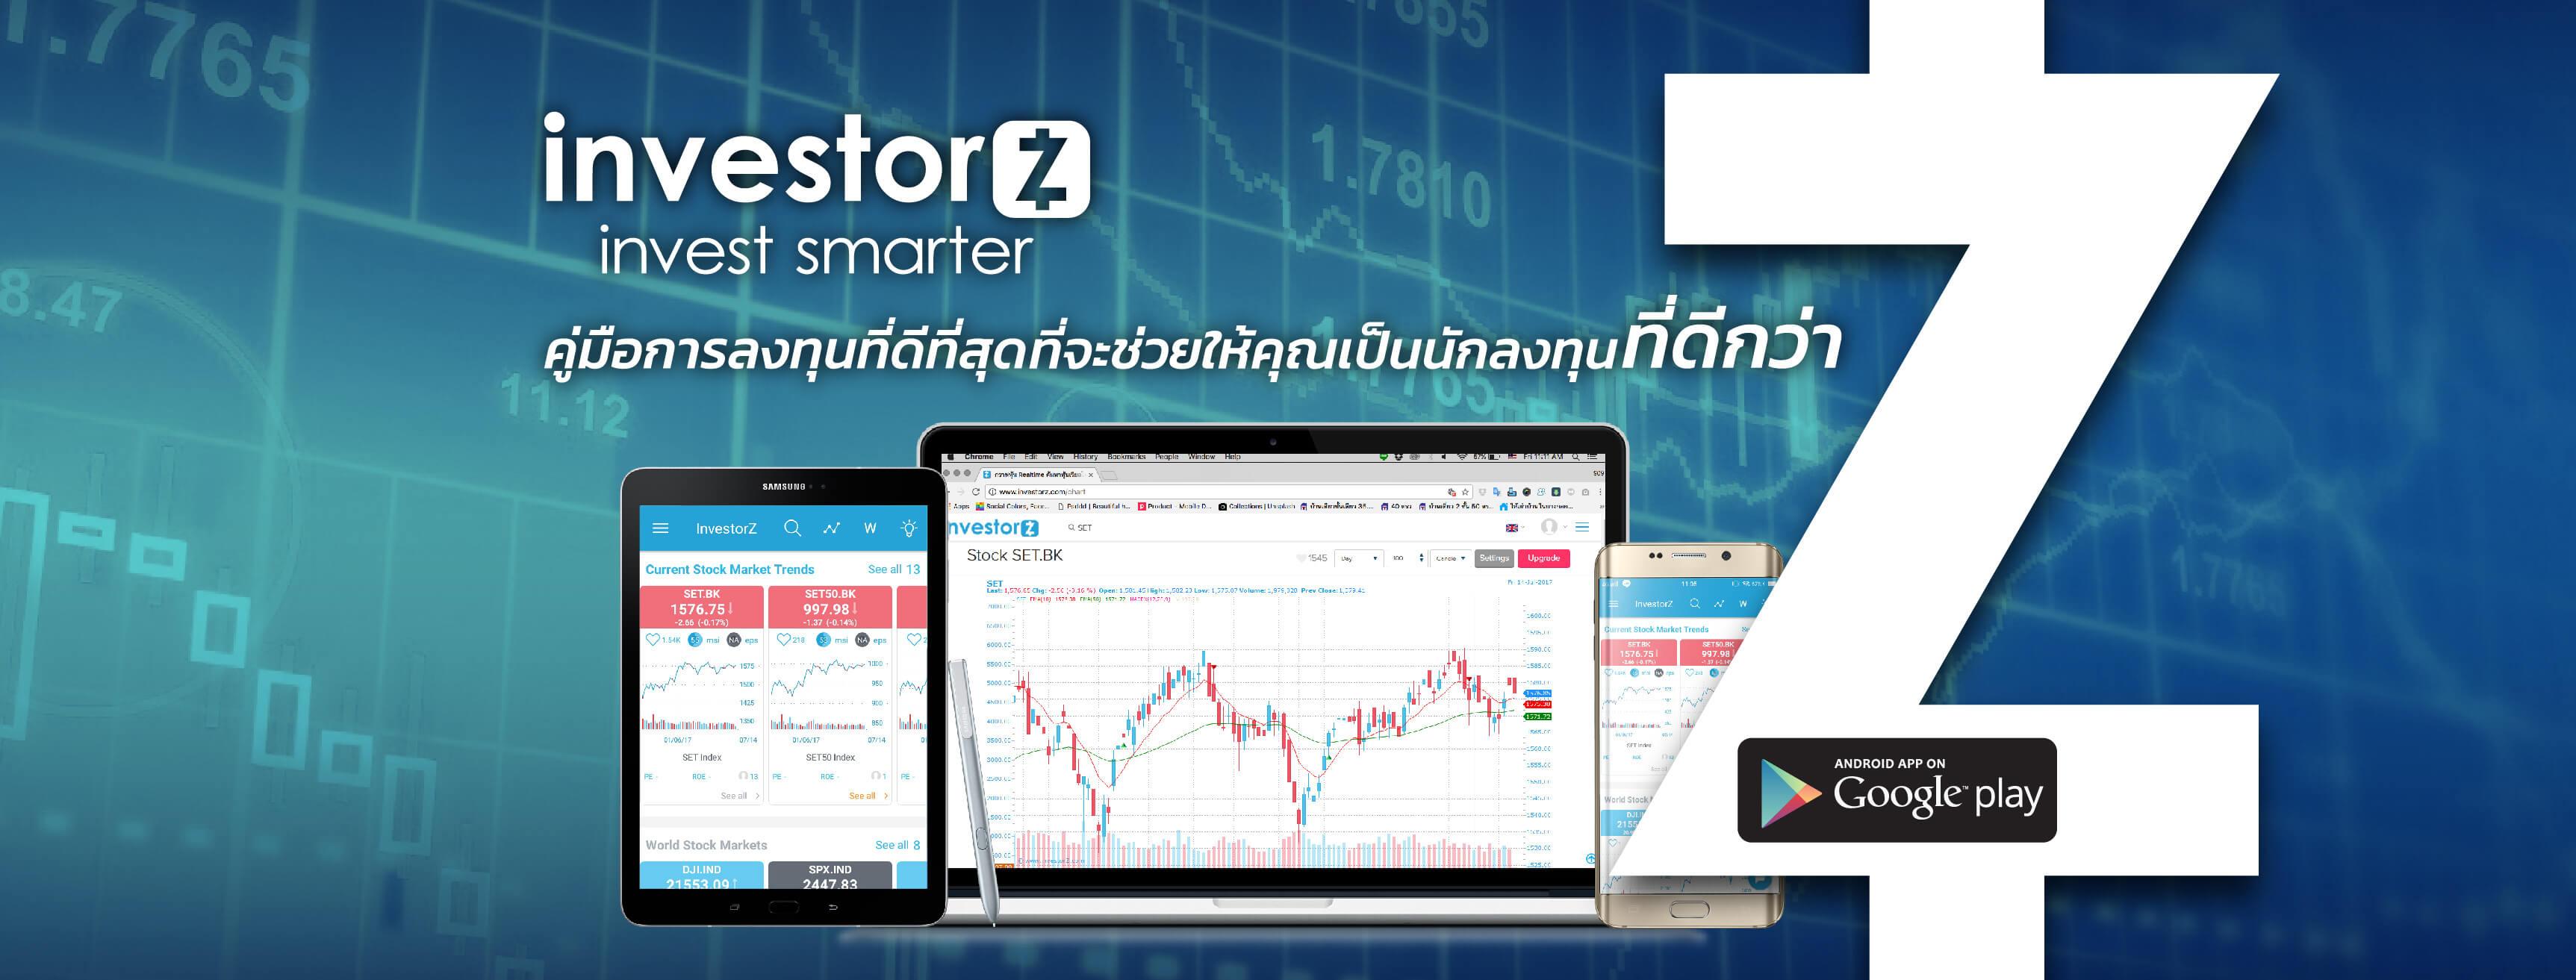 investorz job